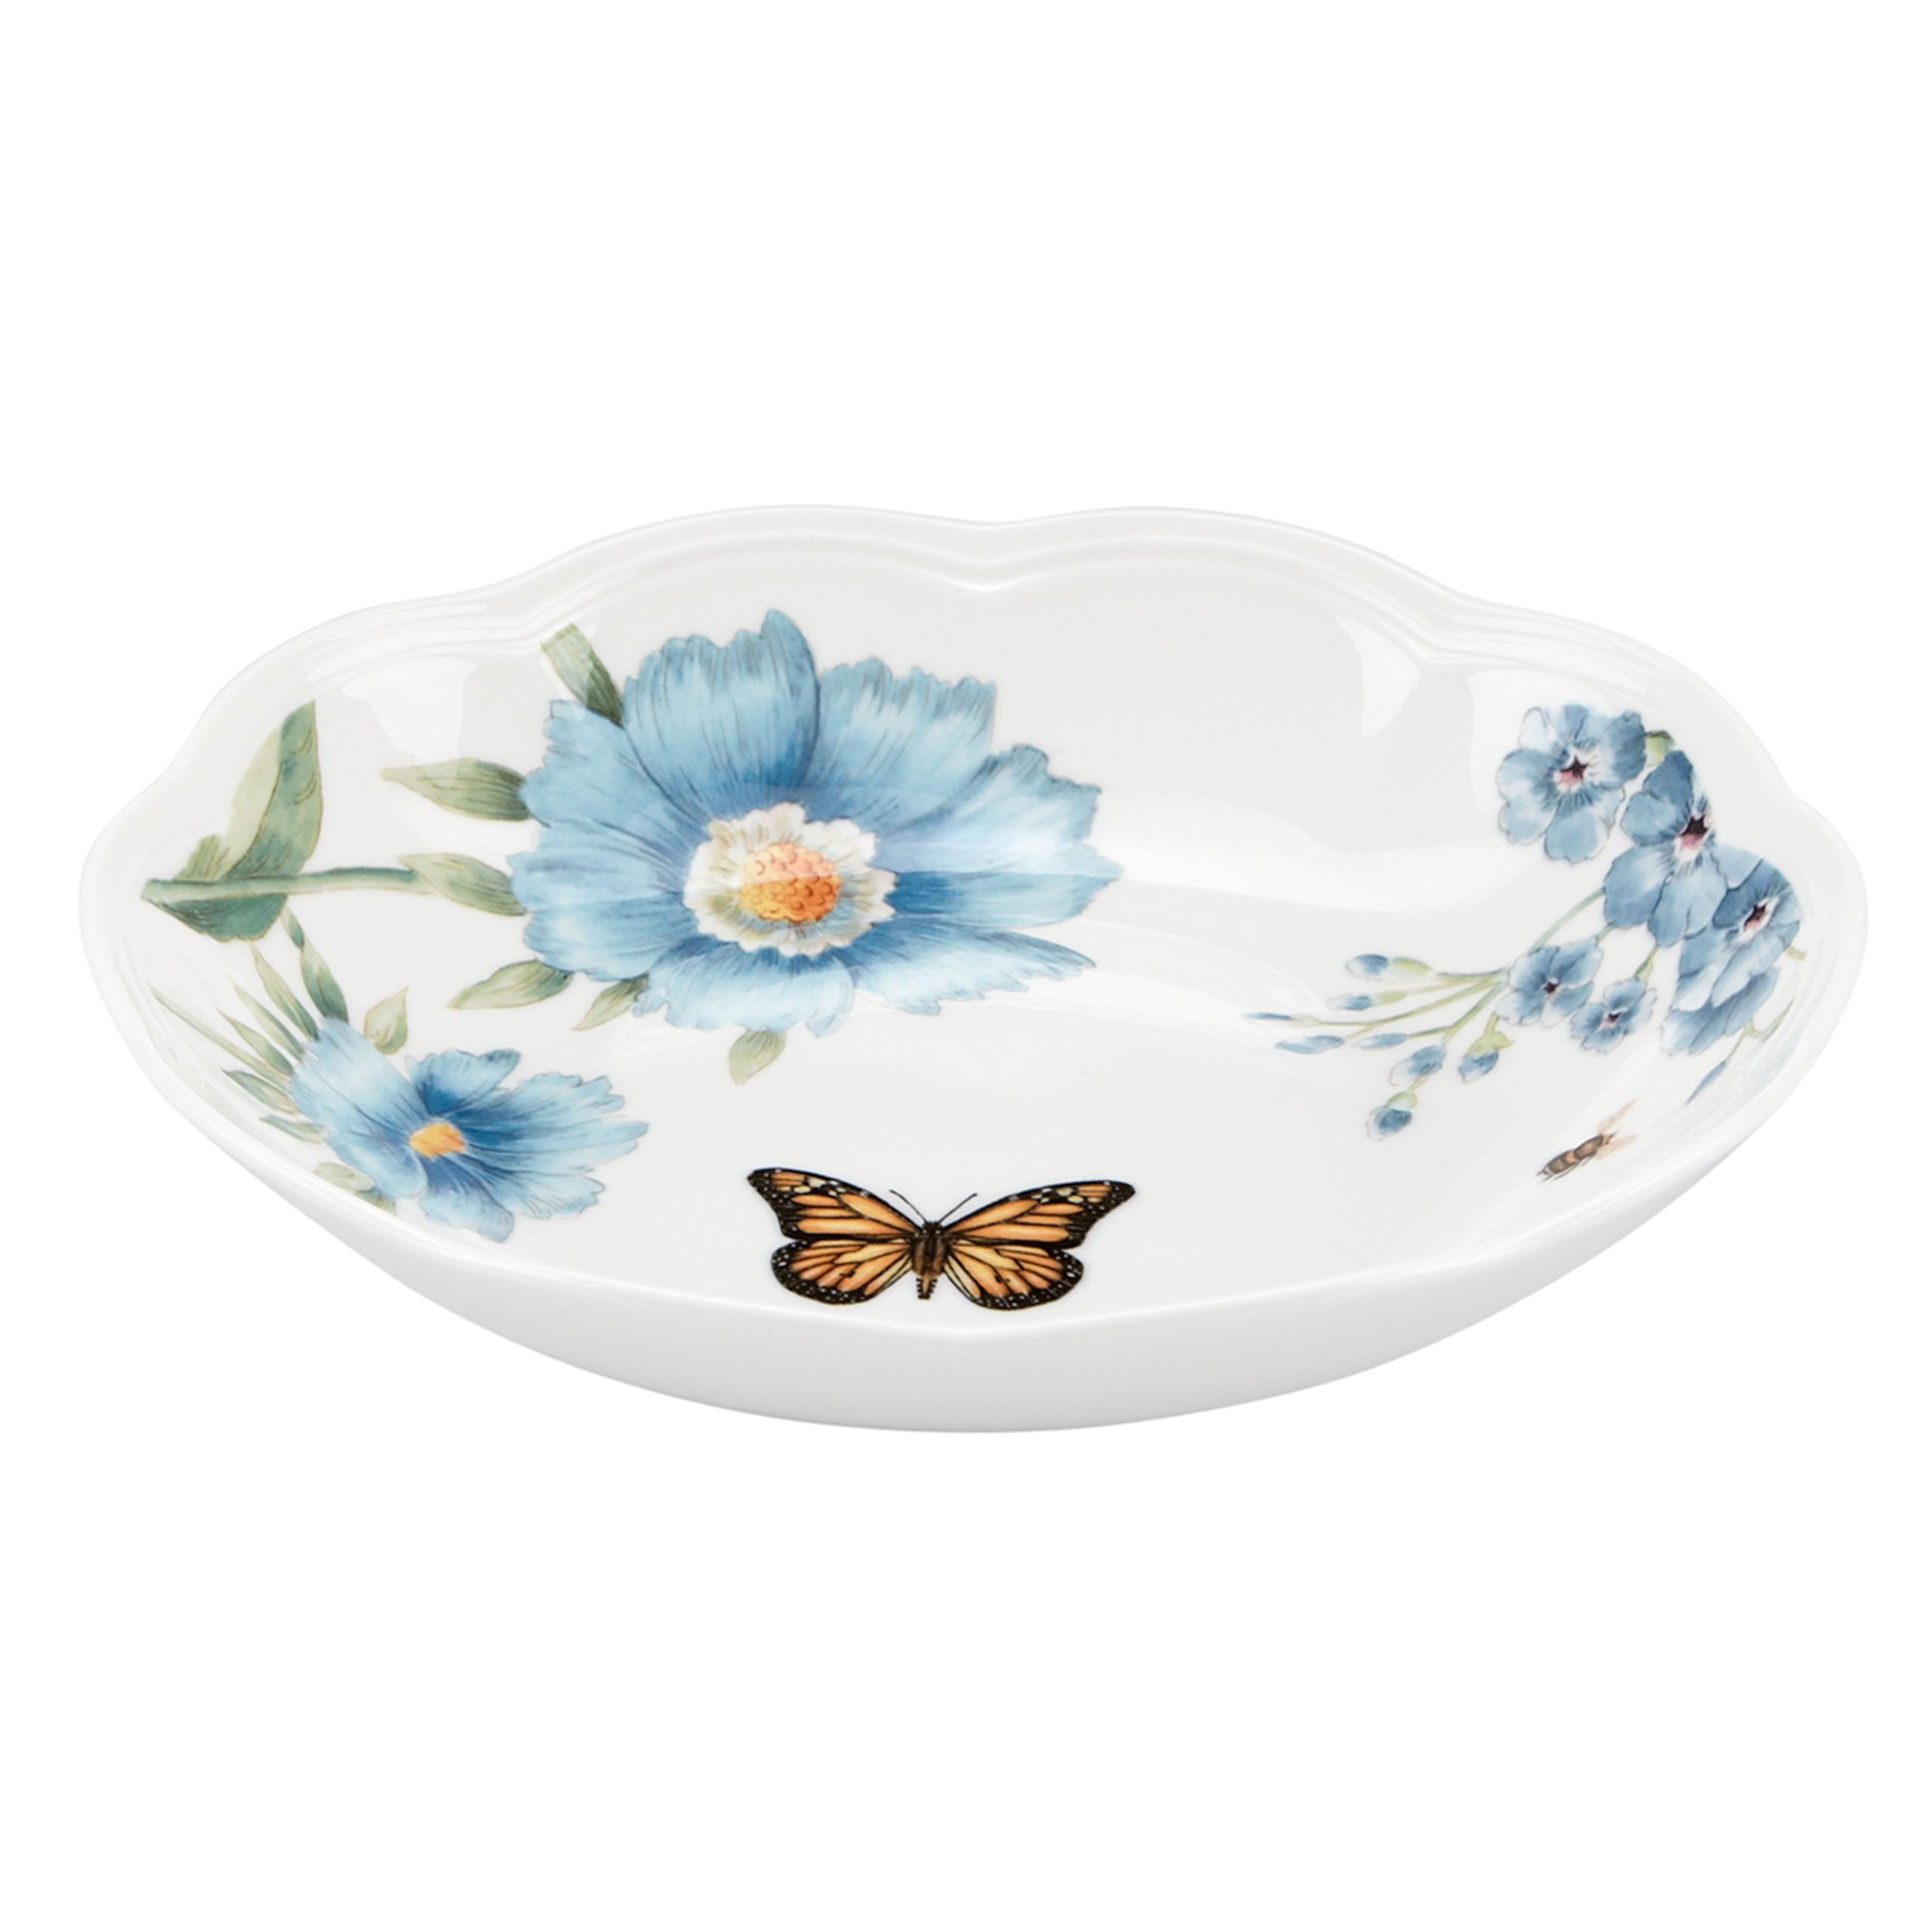 Lenox Butterfly Meadow Blue Pasta Bowl, White